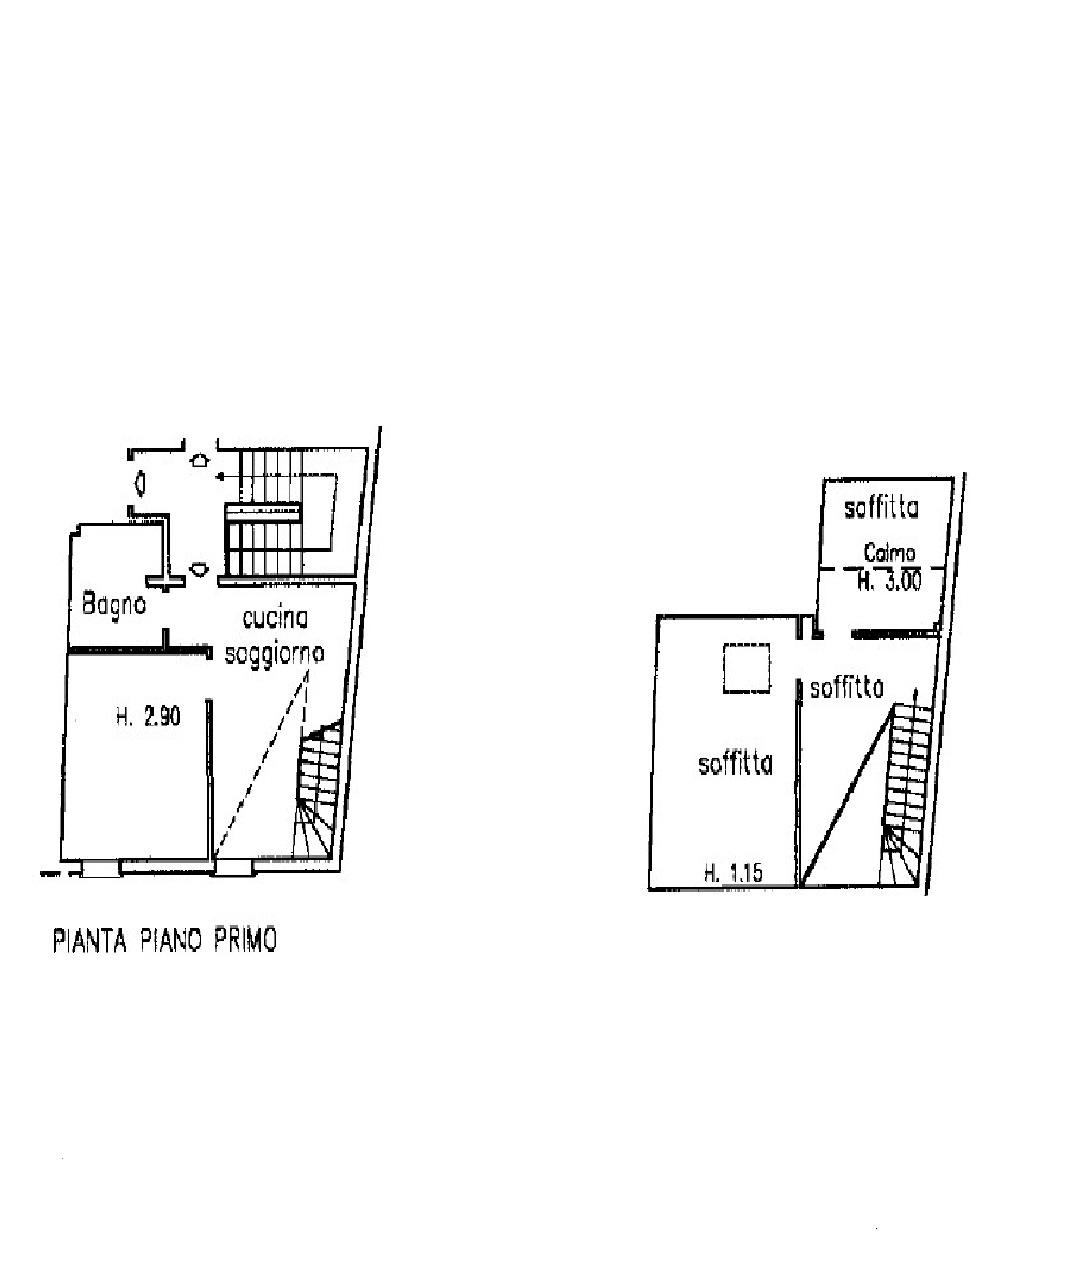 Appartamento in vendita, rif. K156 (Planimetria 1/1)